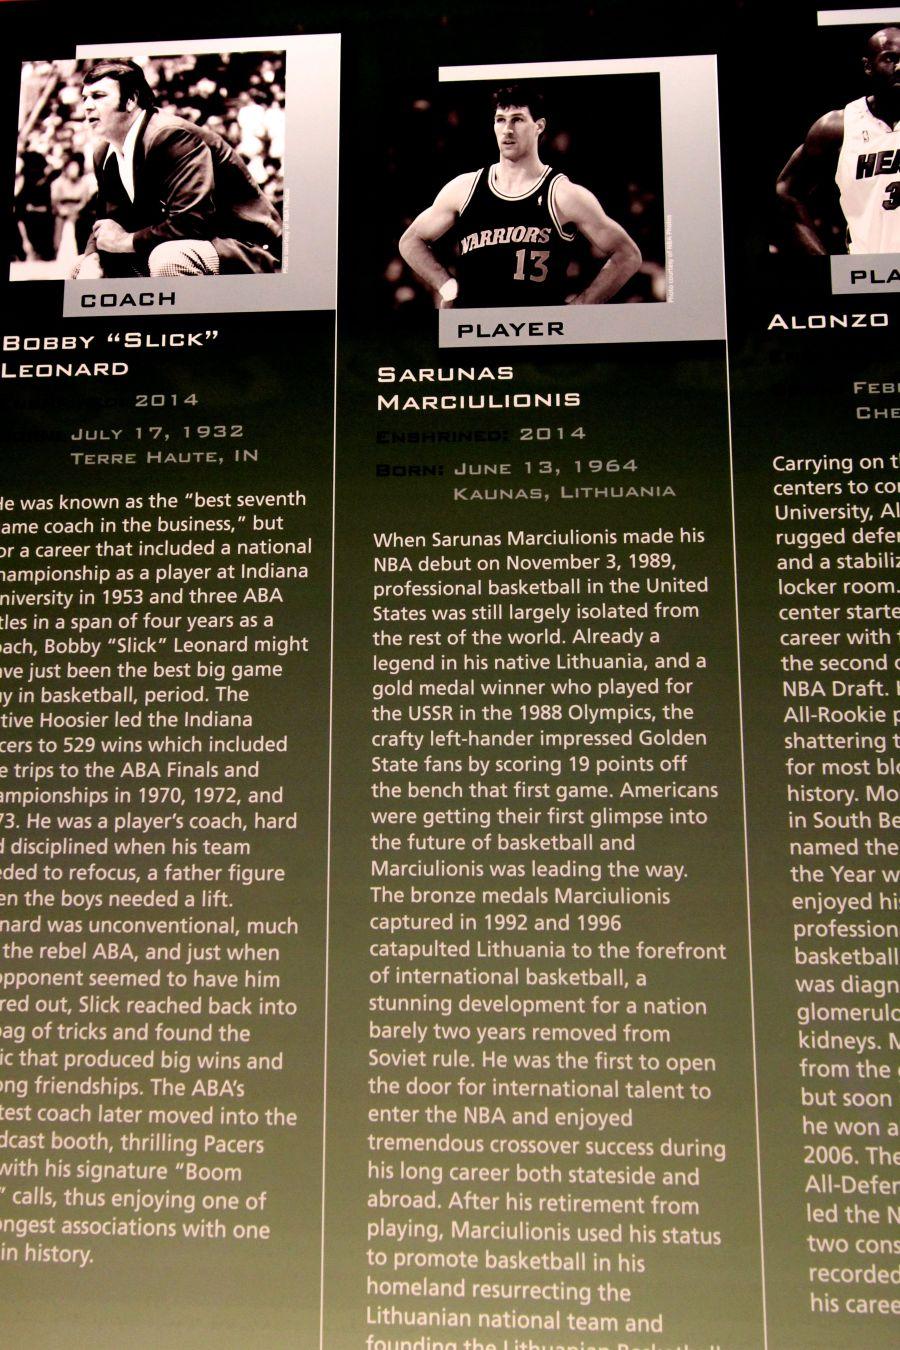 Springfield Naismith Memorial Basketball Hall of Fame sarunas marciulionis biography